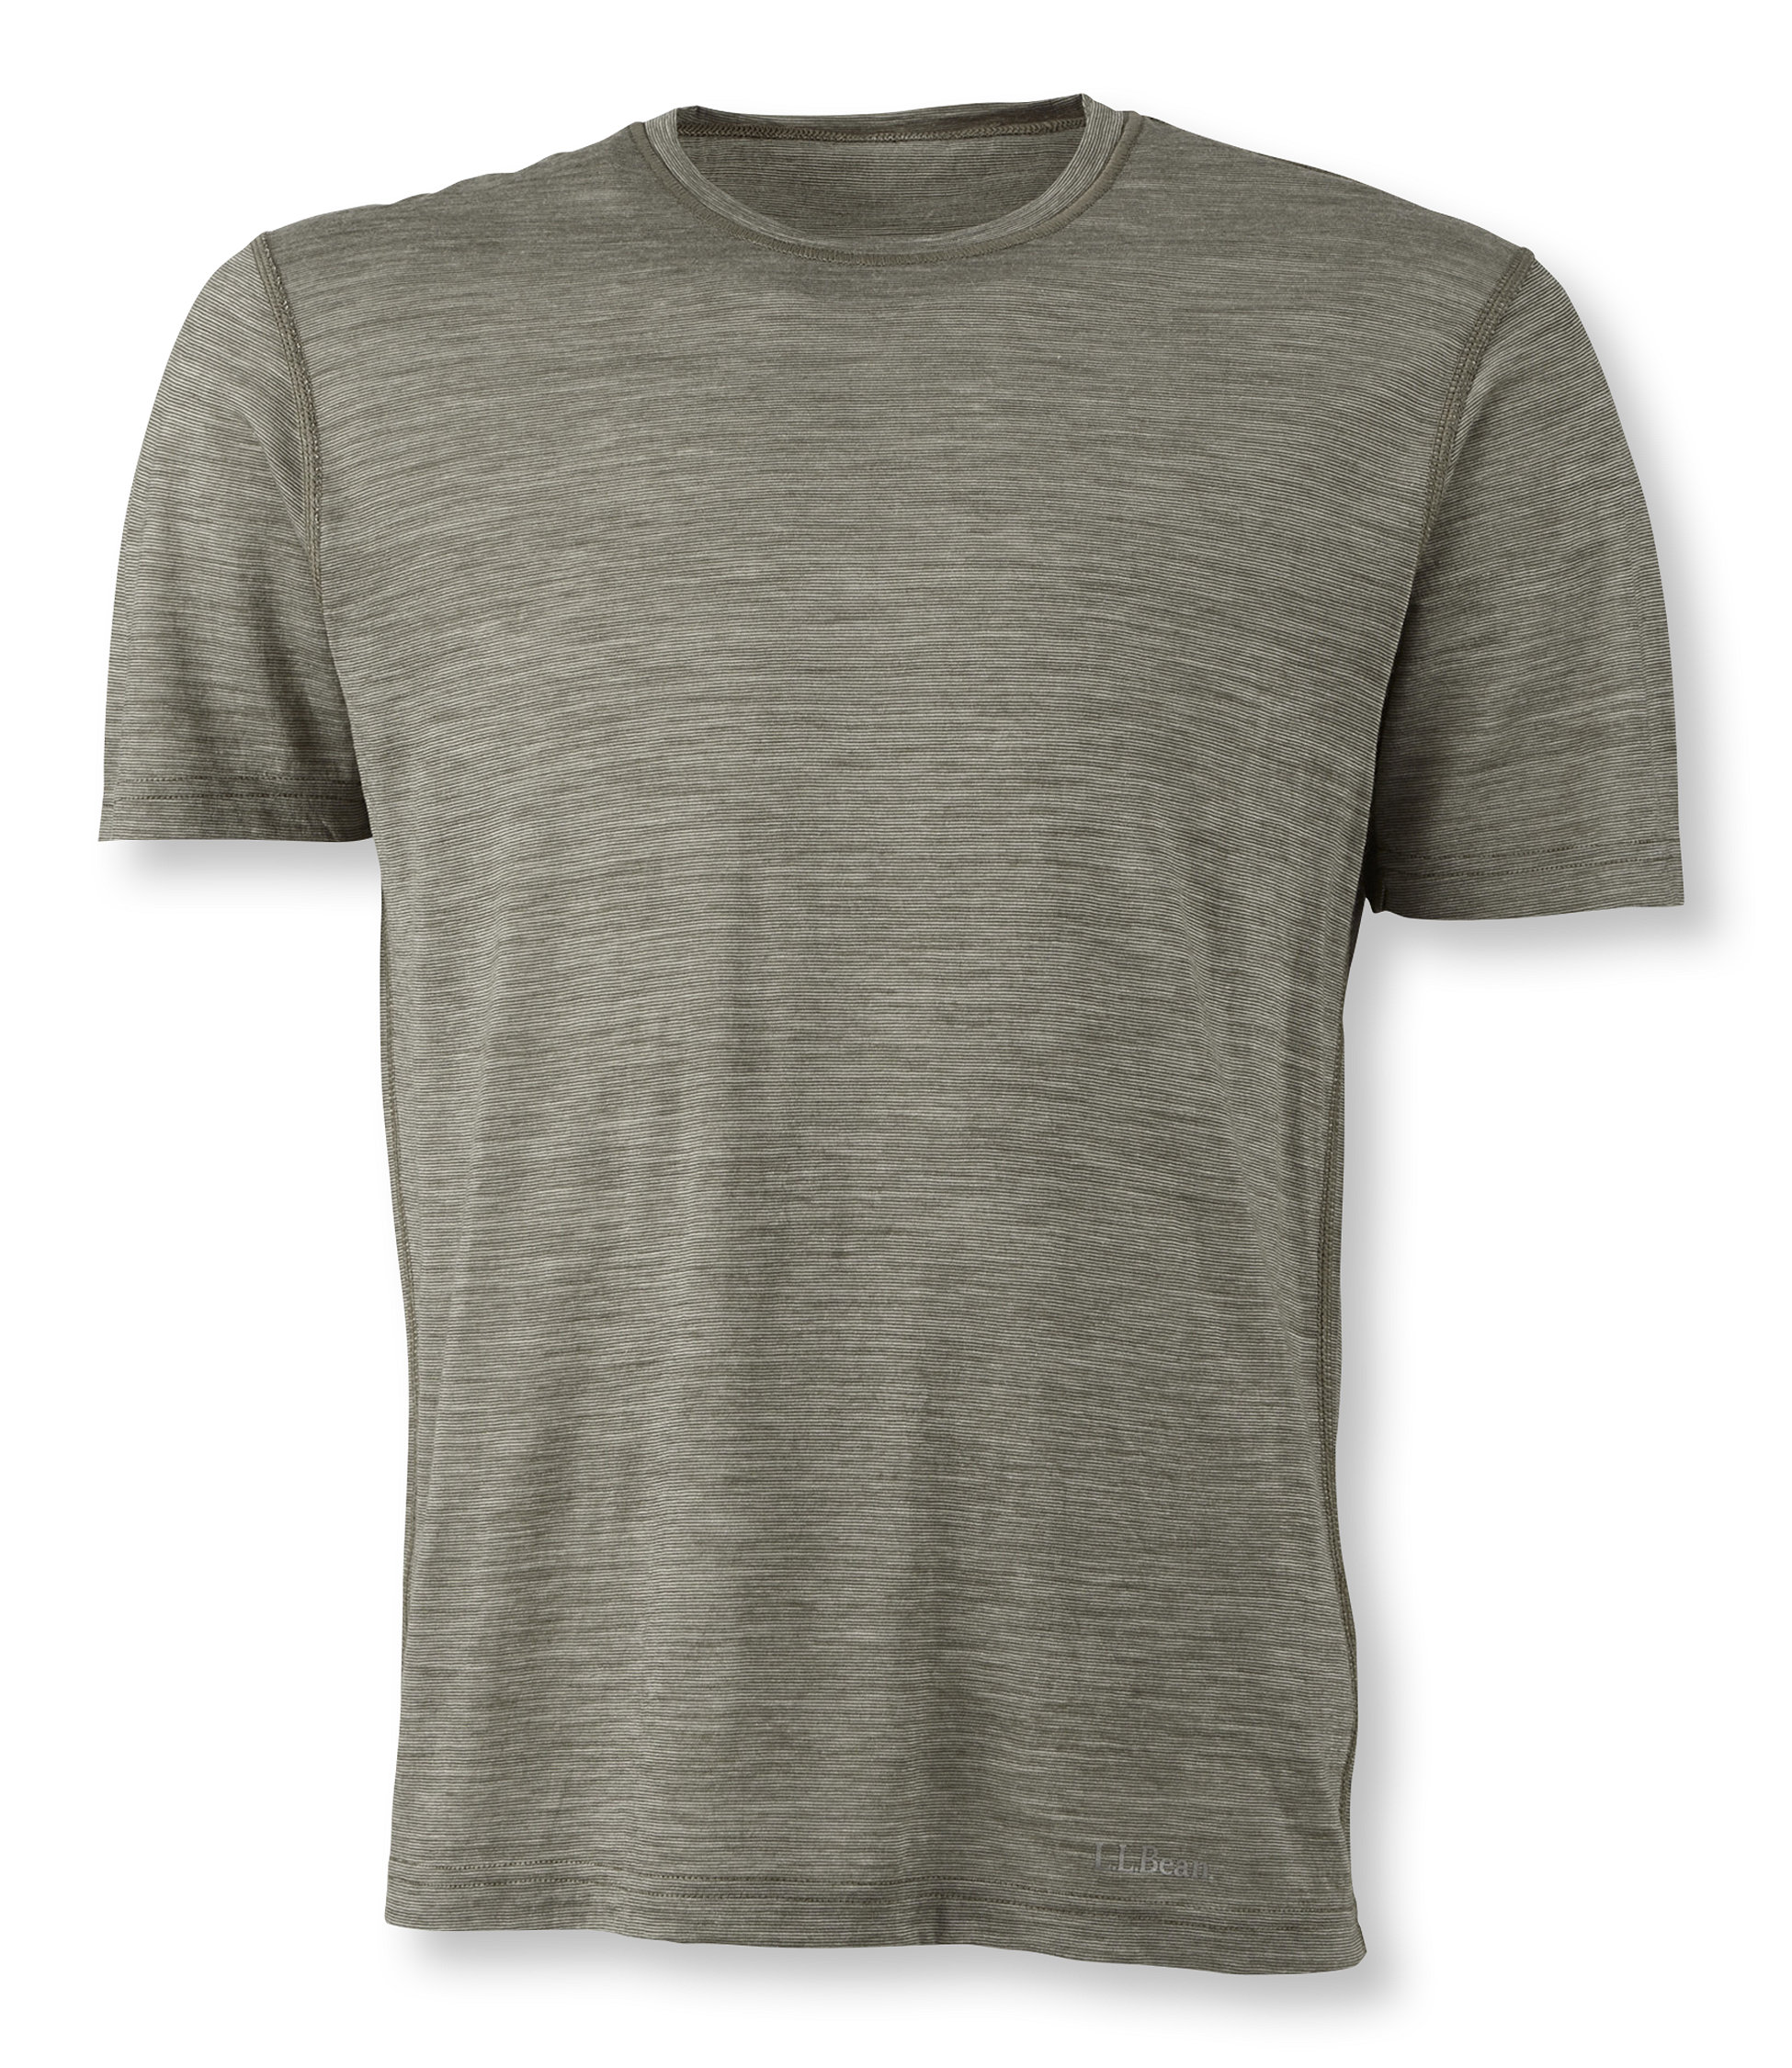 L.L.Bean Cresta Wool Ultralight Base Layer Short Sleeve